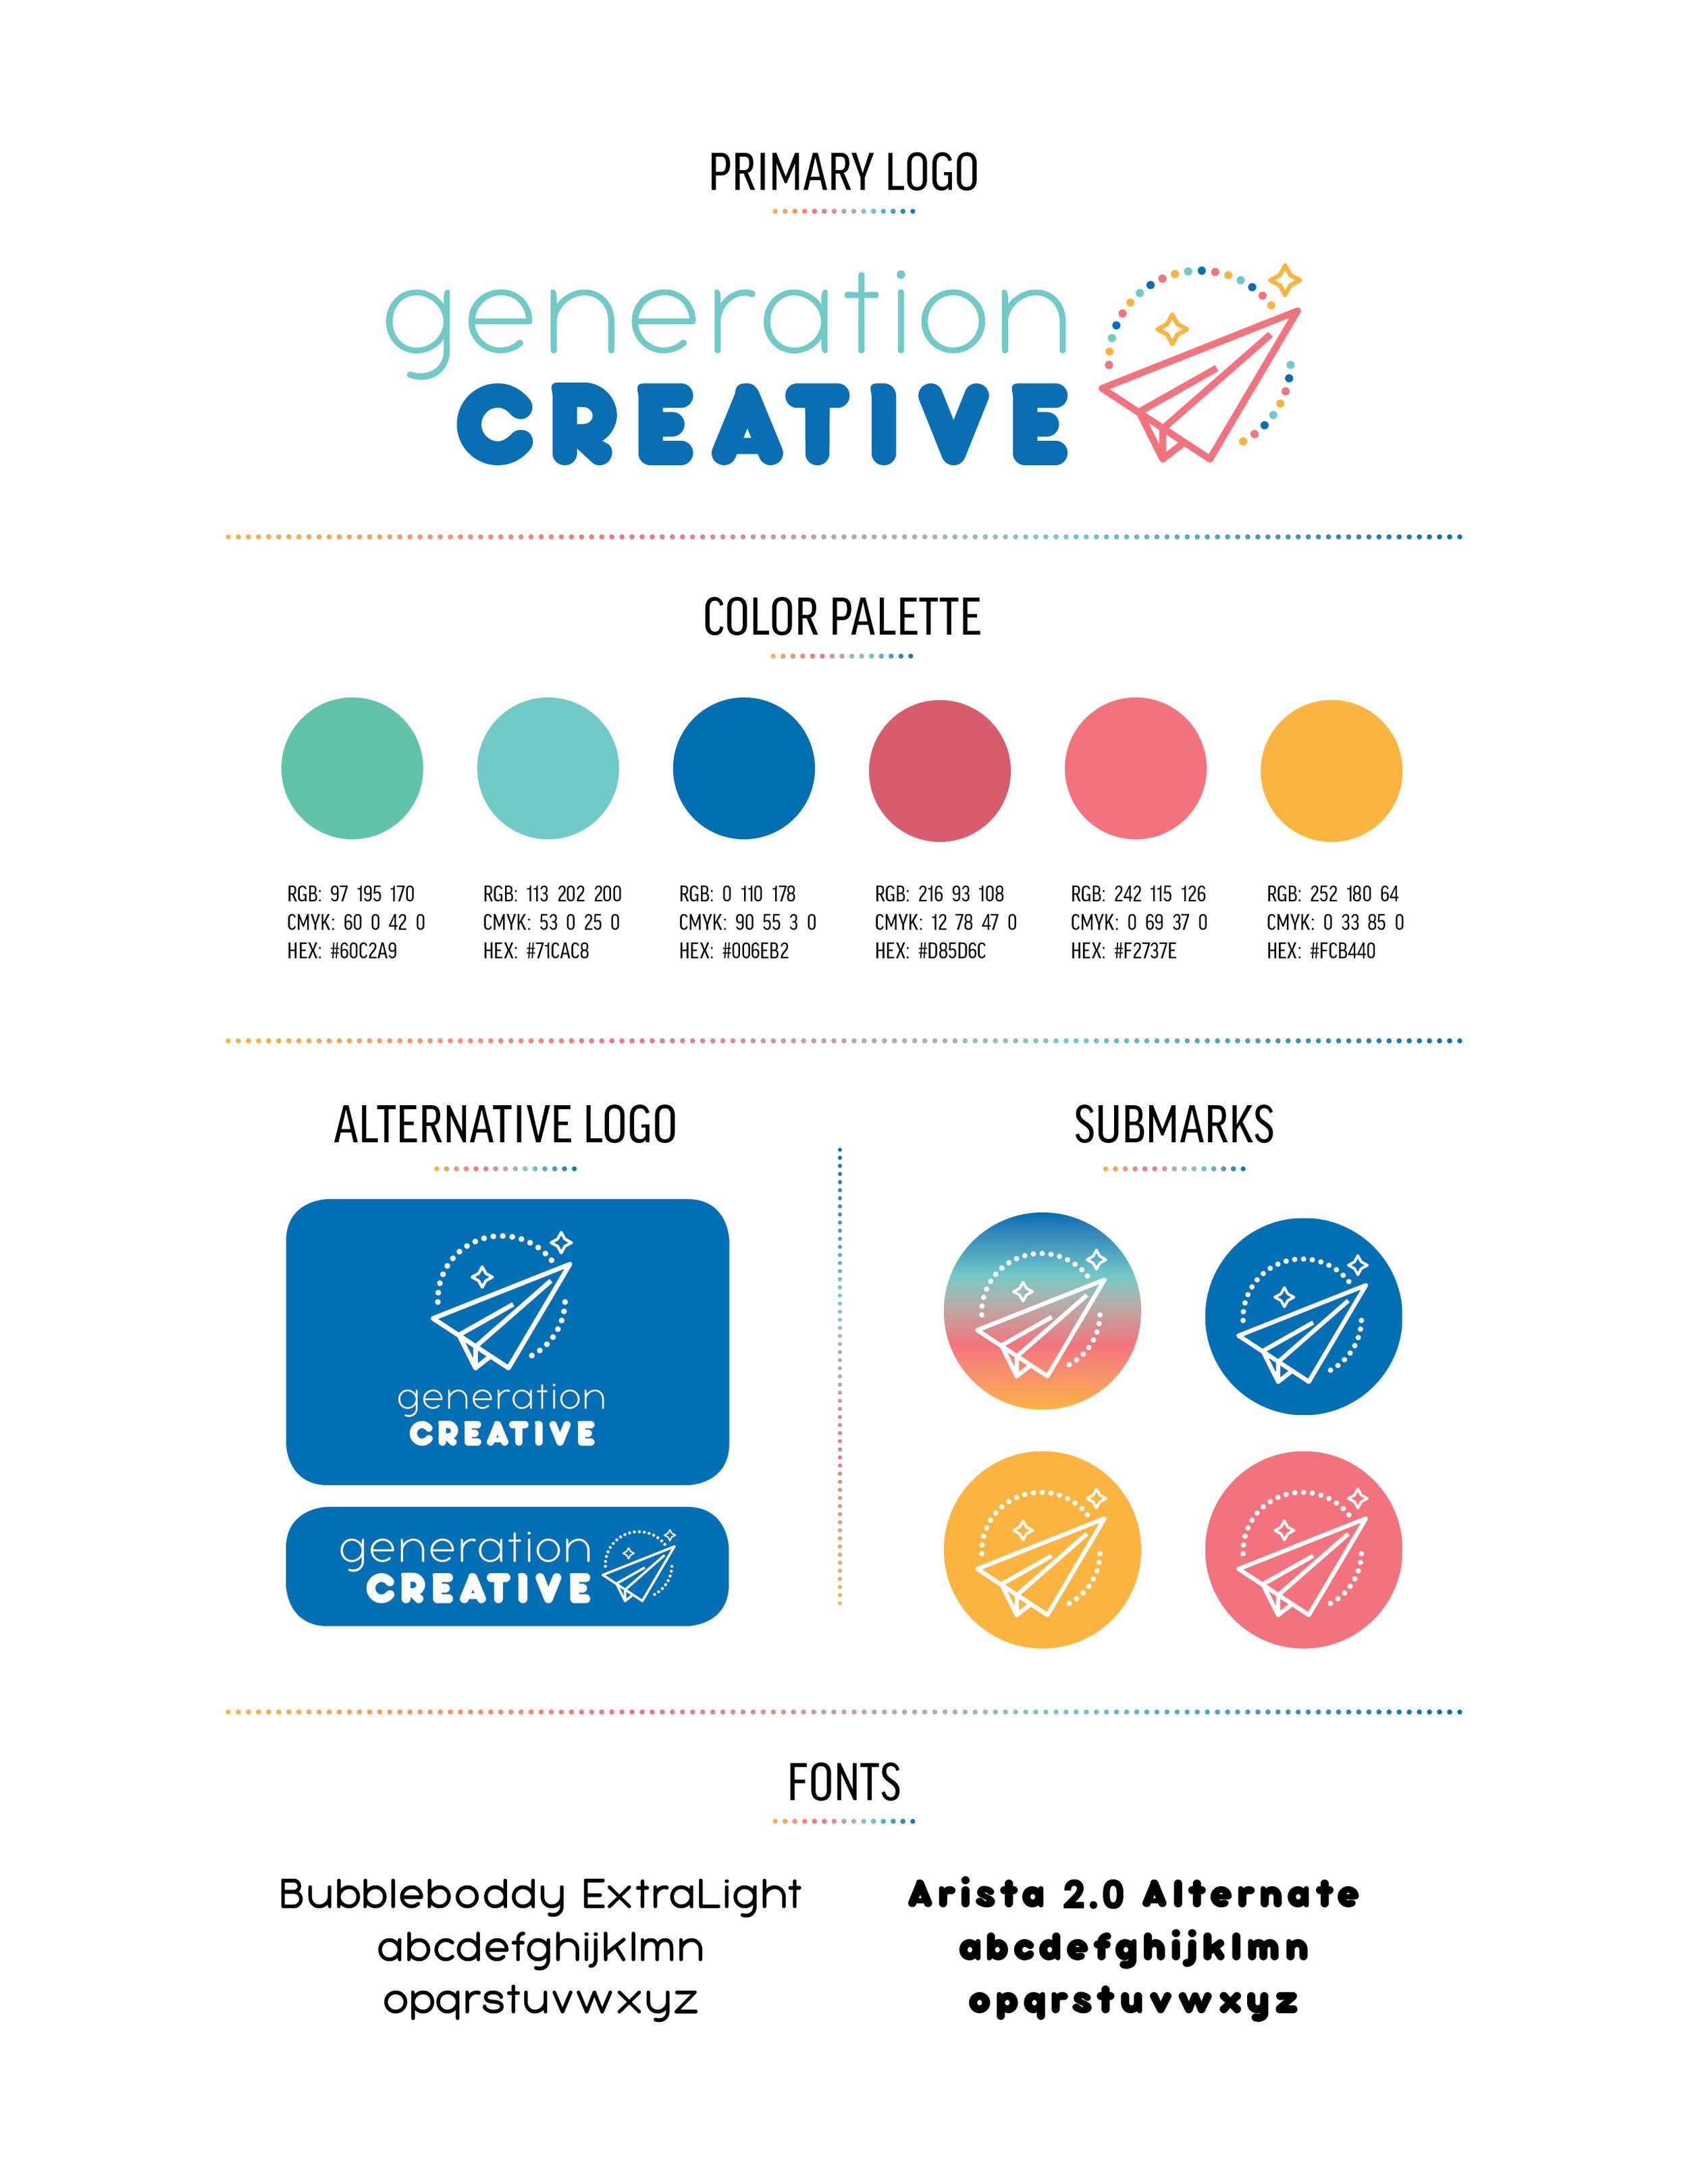 Generation Creativebrand.jpg